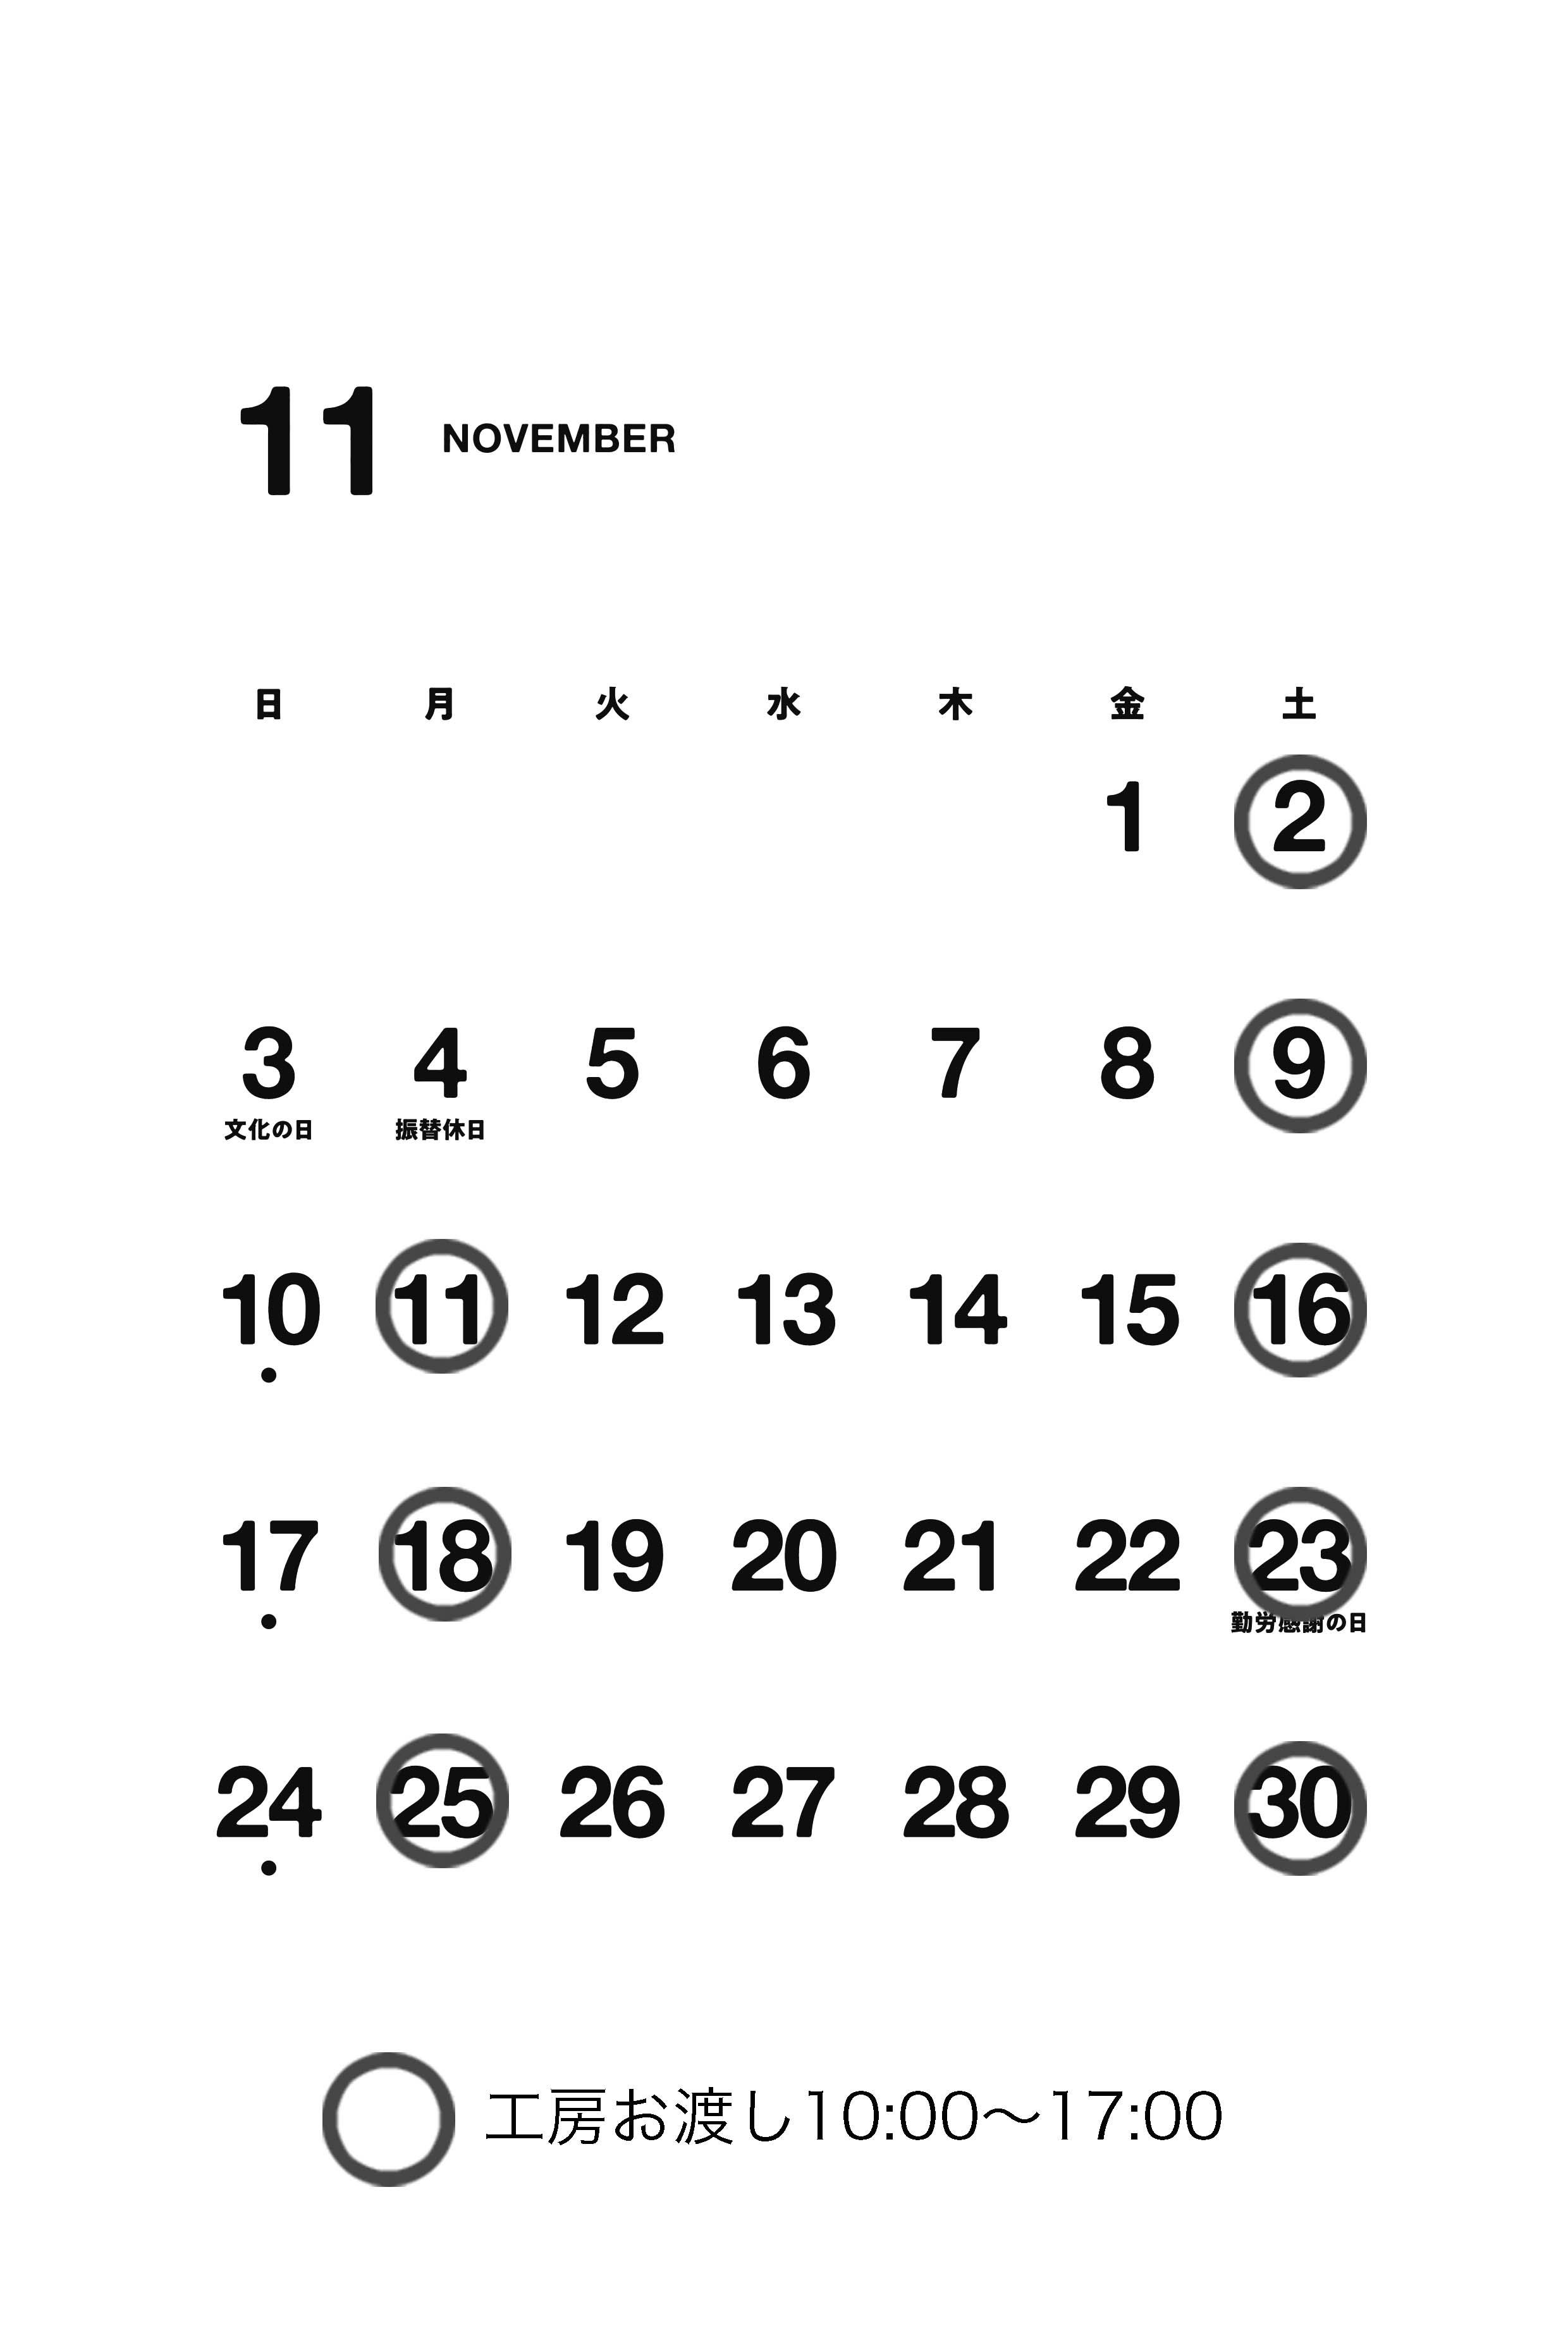 180507_calendar_0037_2019